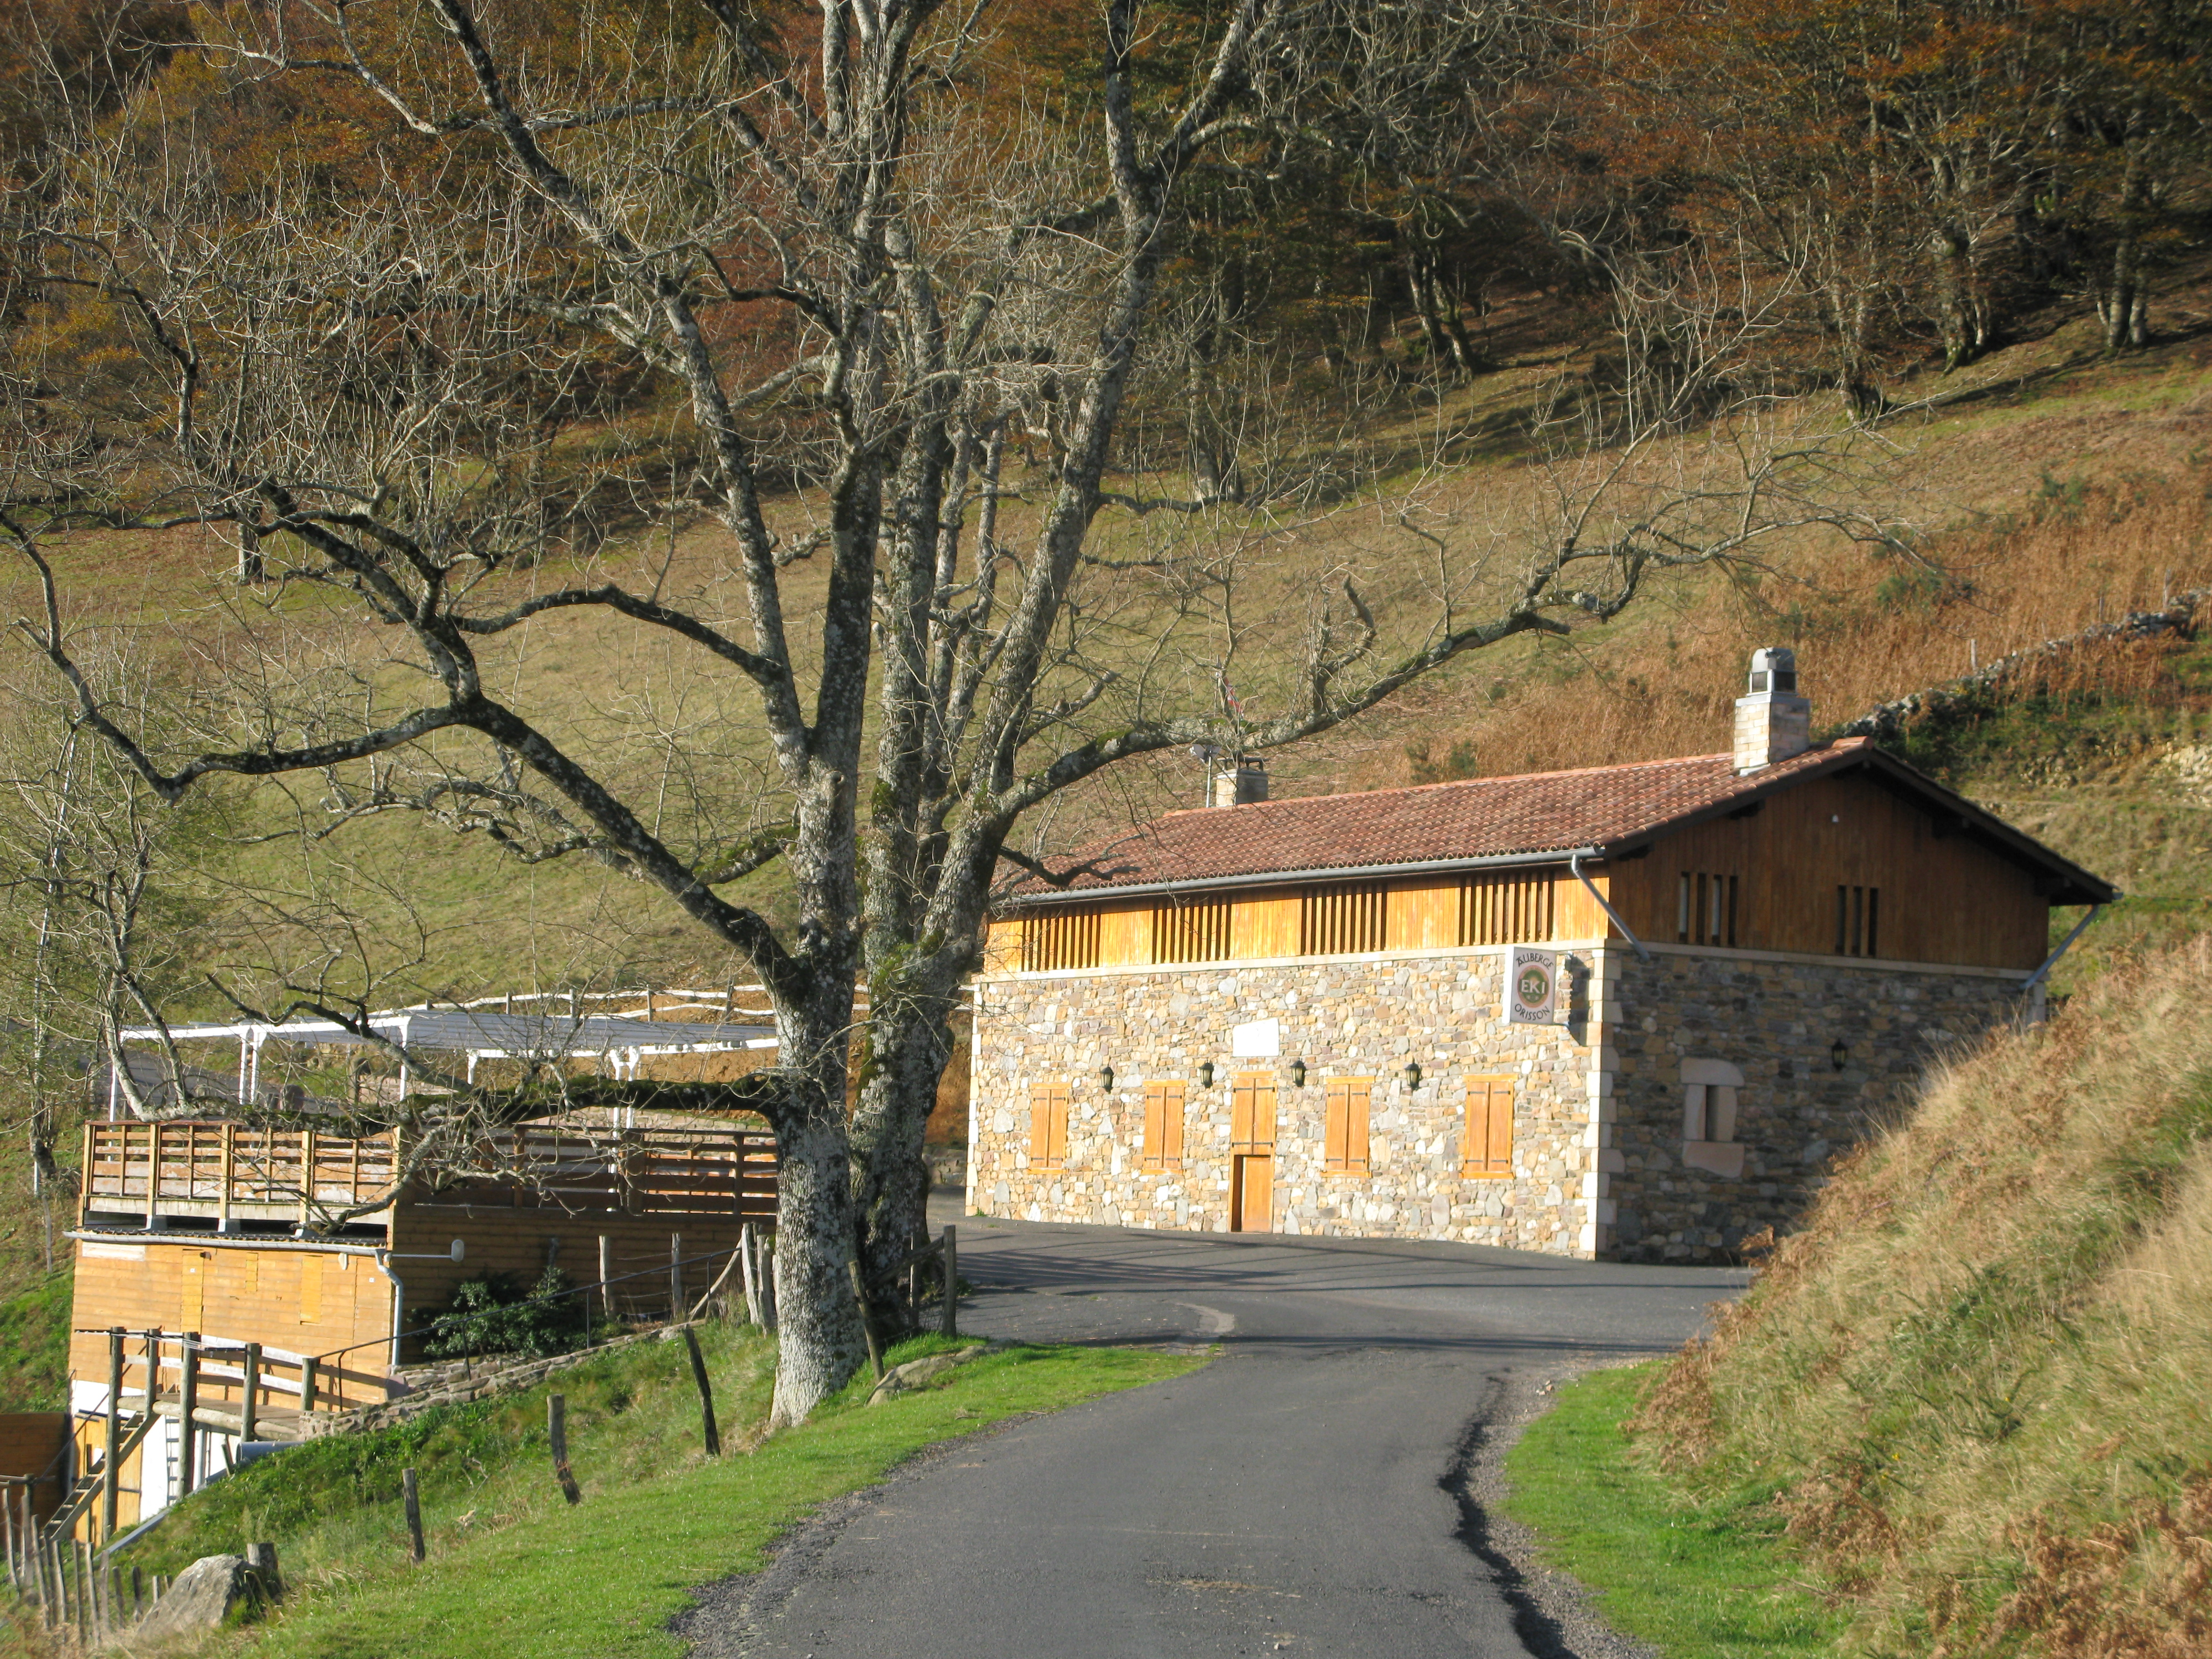 Walking the camino de santiago from saint jean pied de port in france to roncesvalles in - St jean pied de port to roncesvalles ...